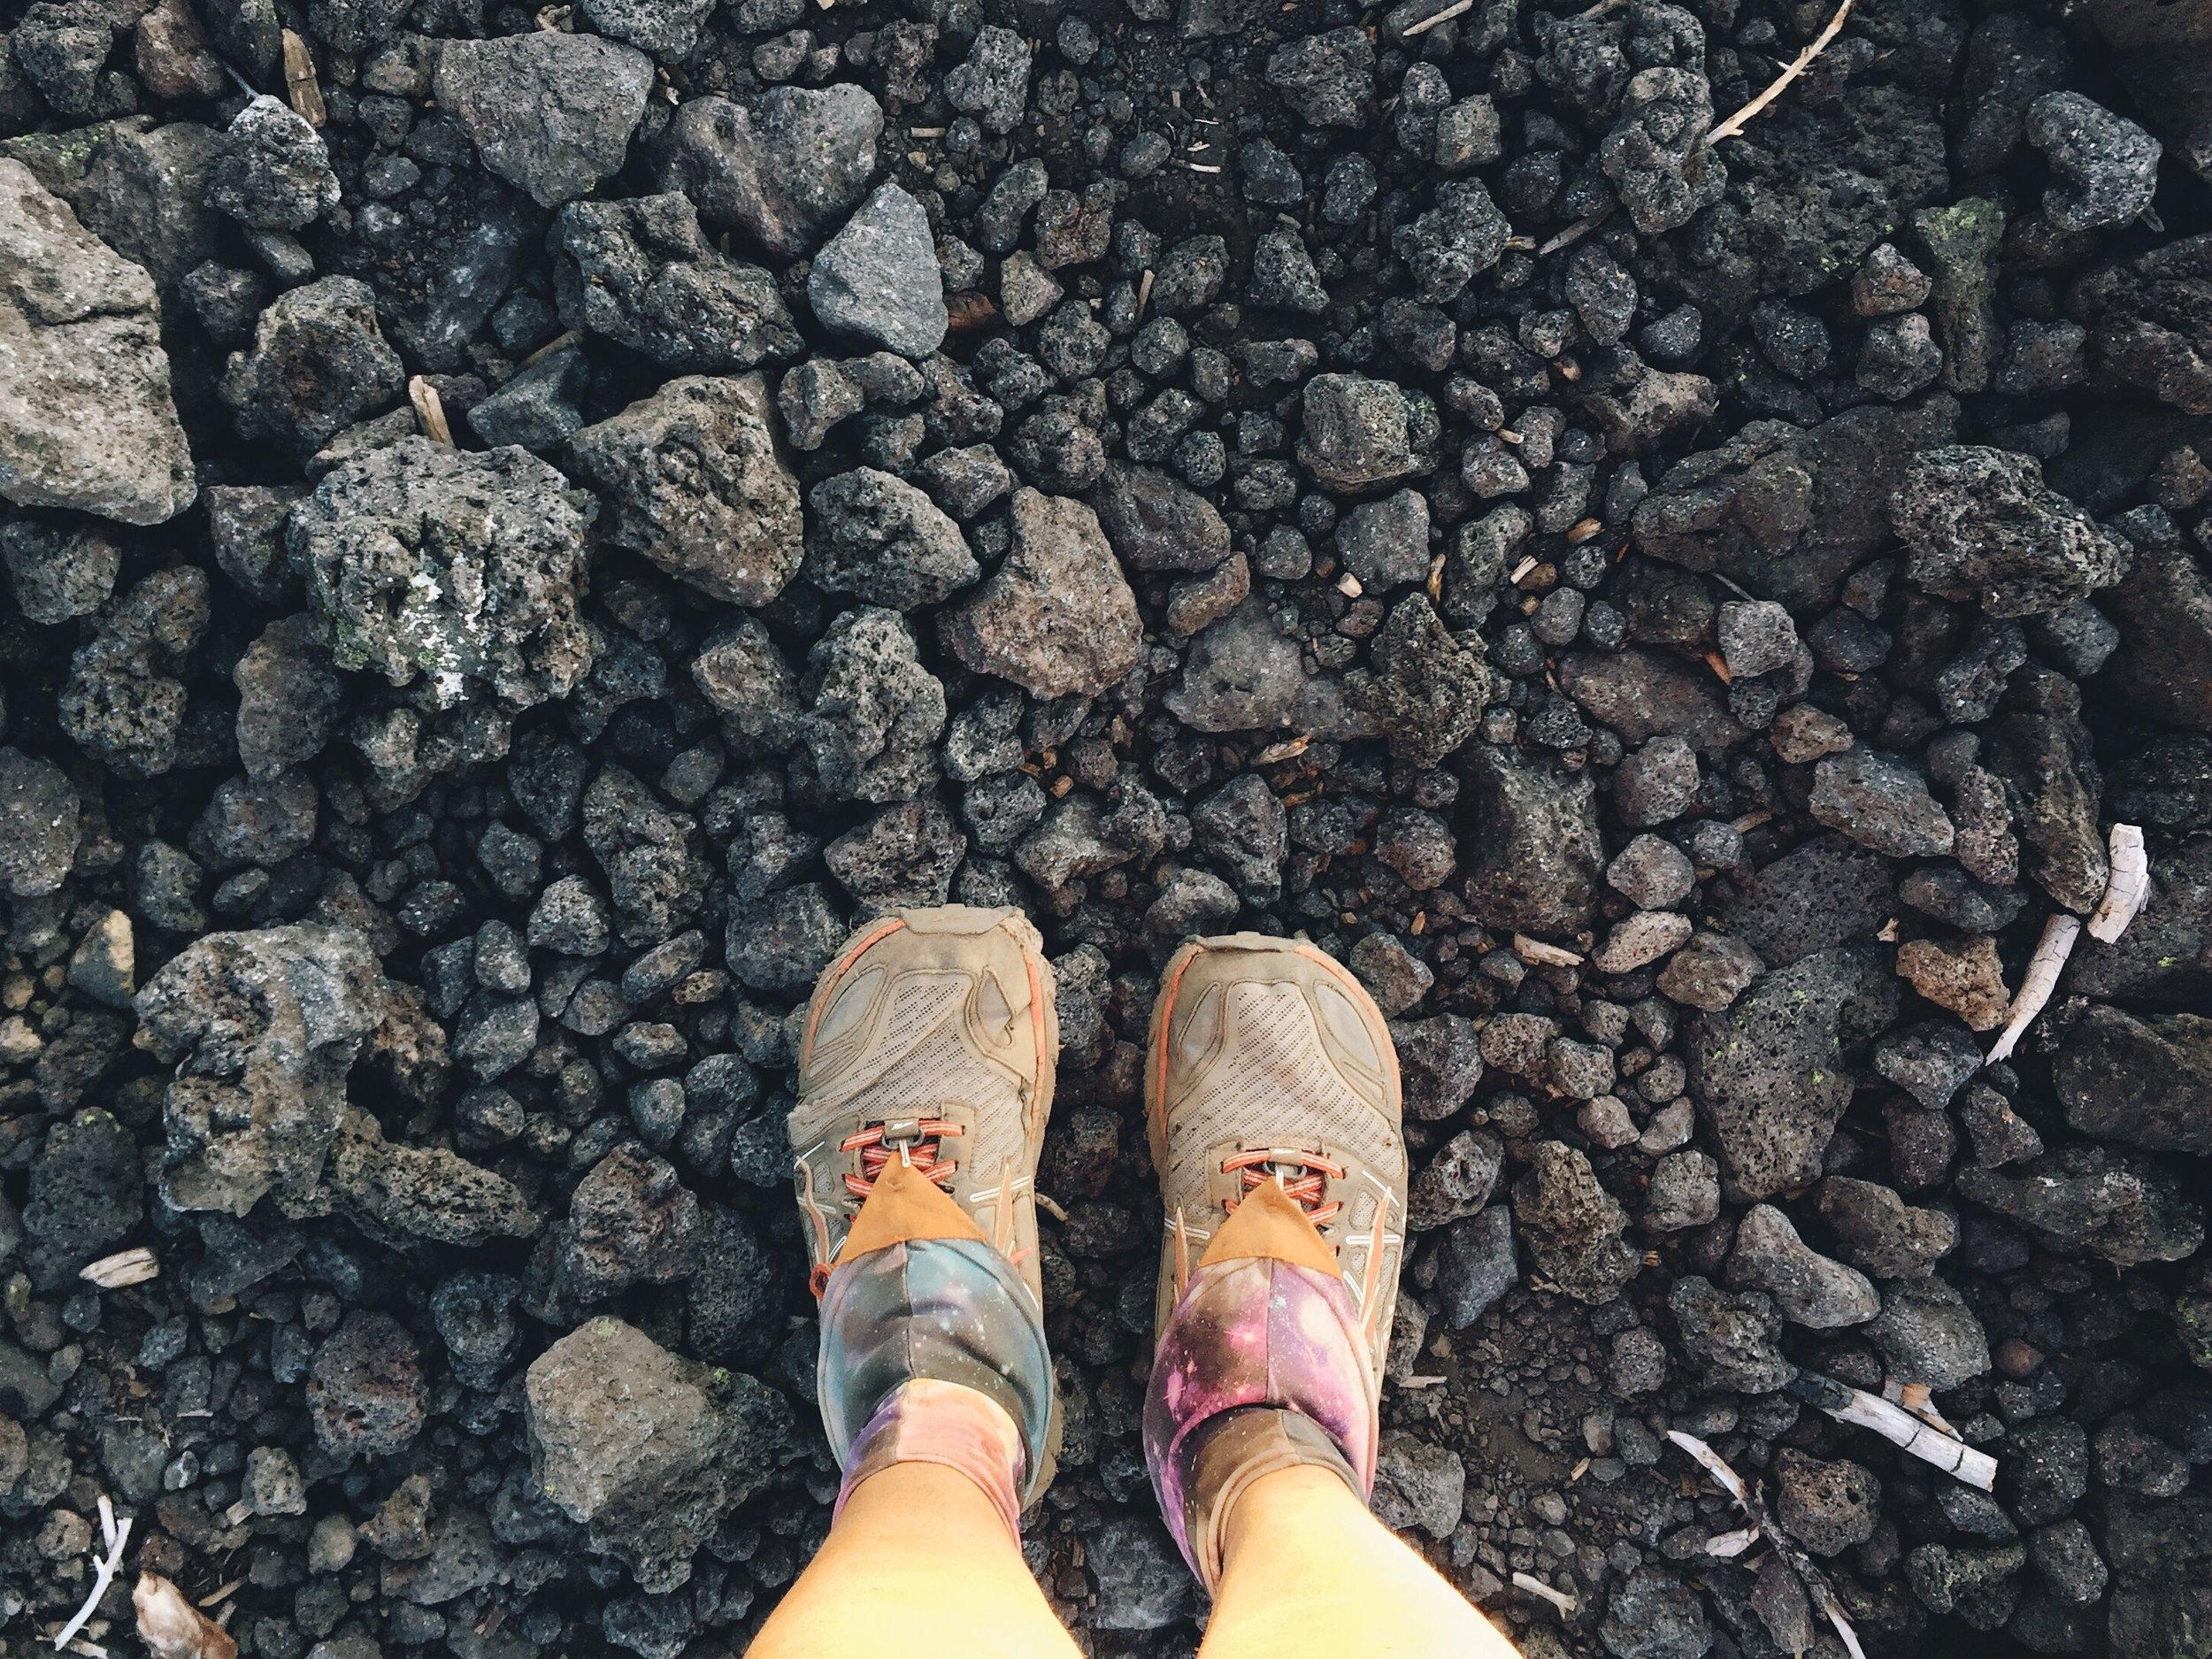 the lava rocks weren't too bad